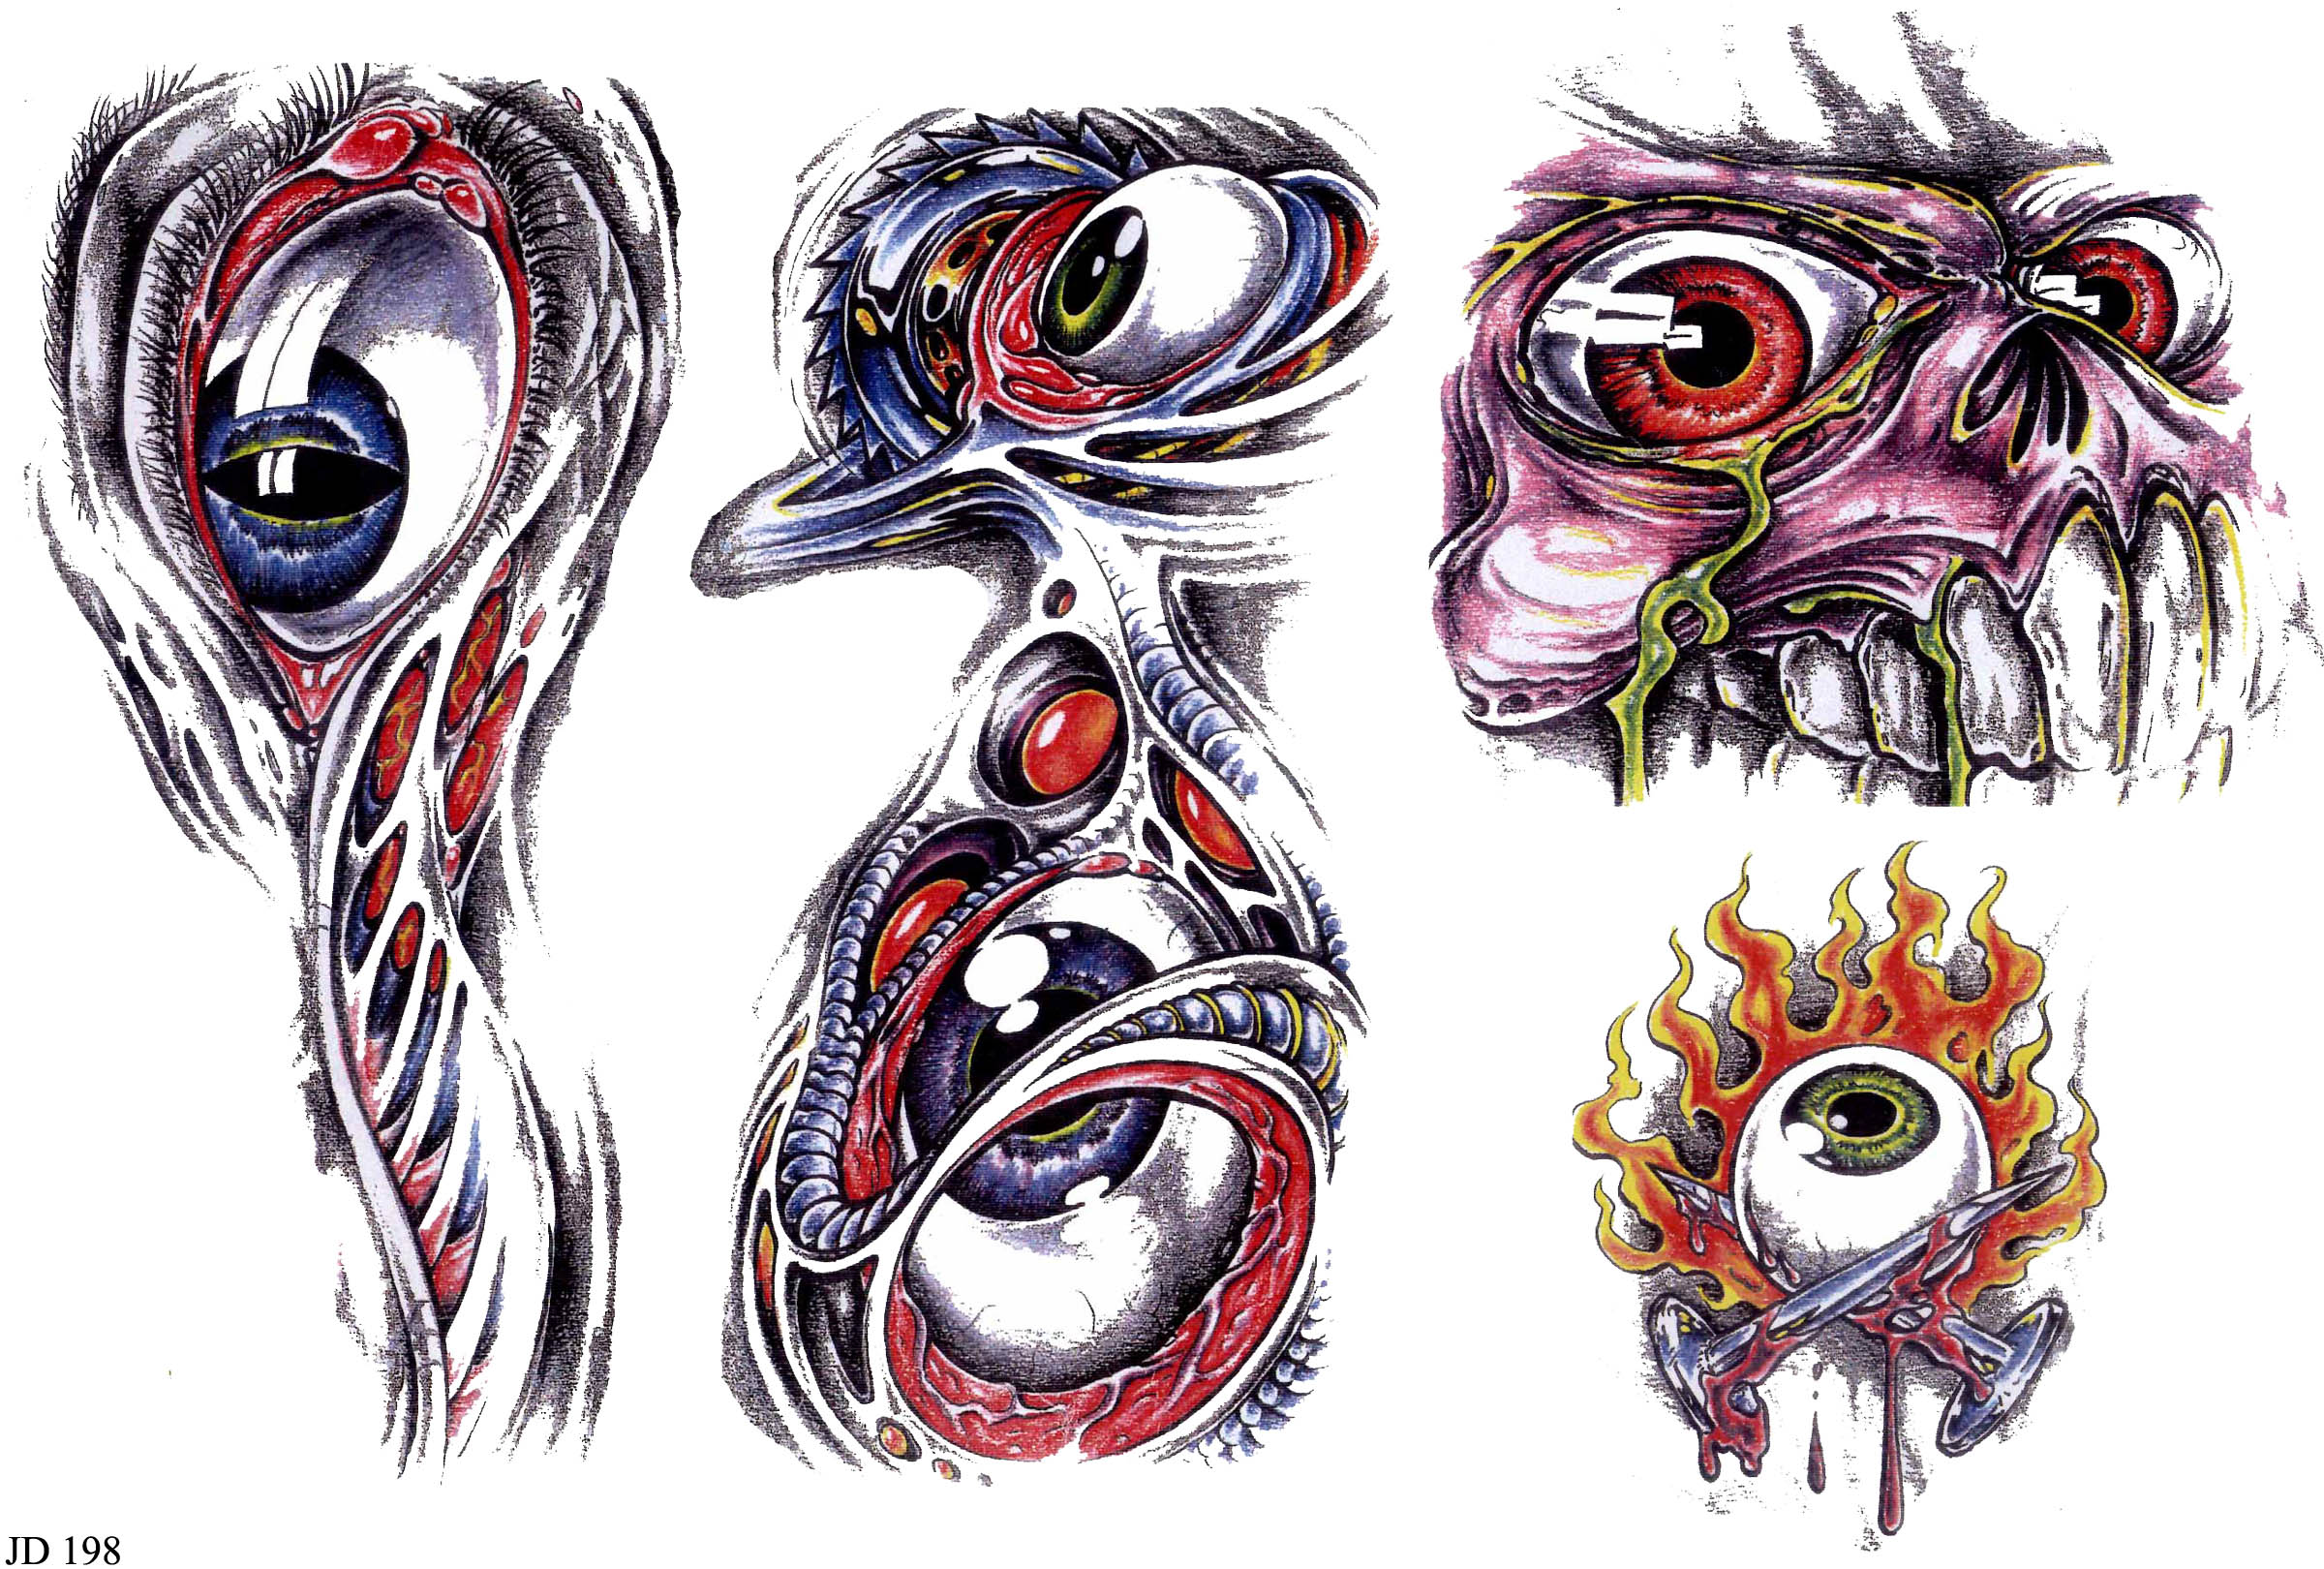 Biomechanical tattoos designs - Biomechanical Eyes Tattoos Designs